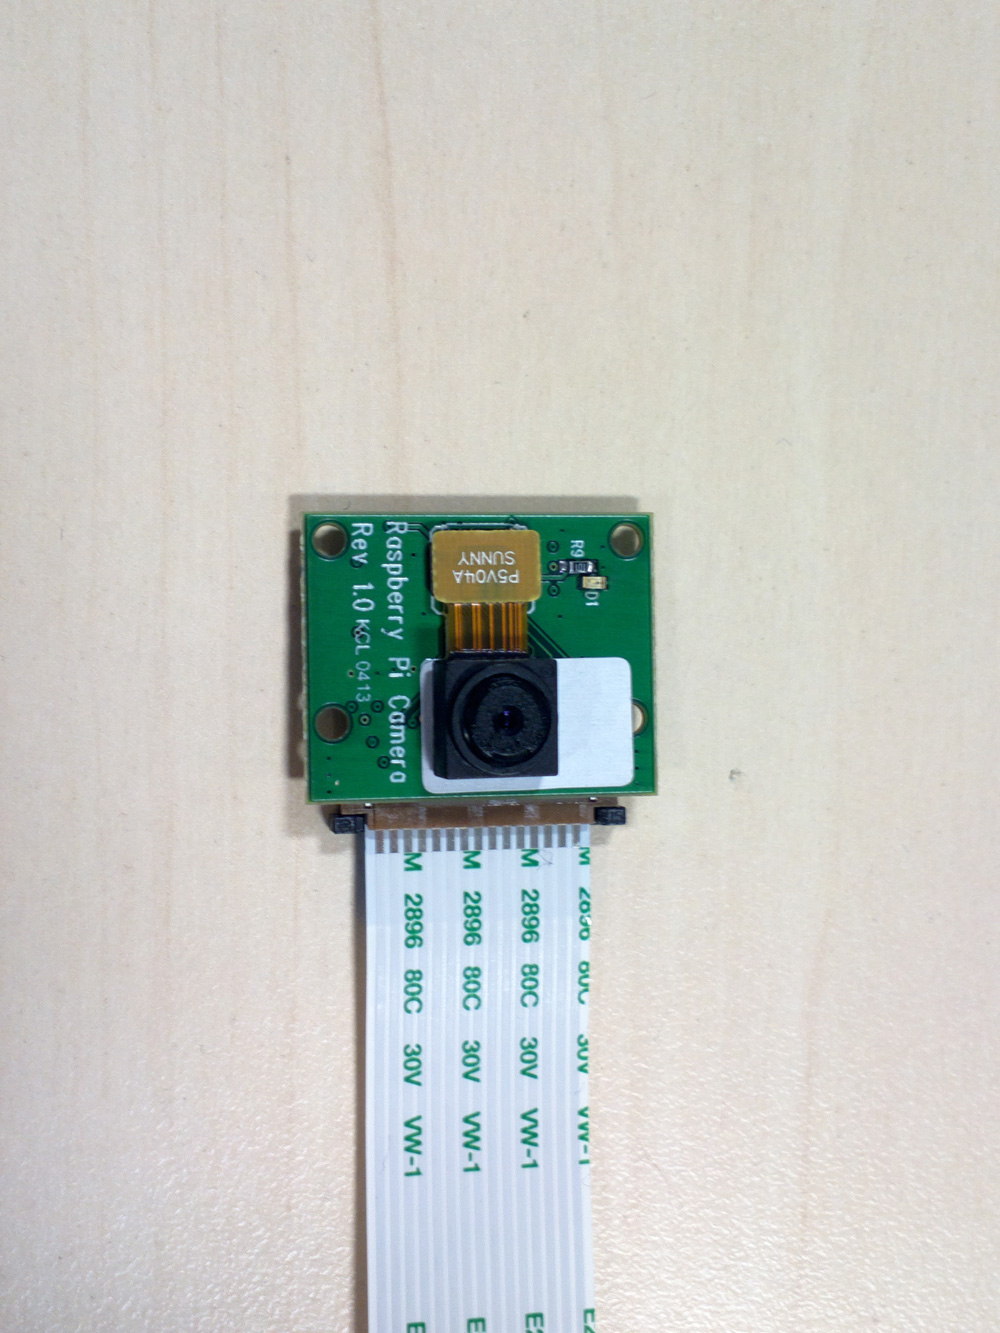 Raspberry Pi camera module sneak peek, and Model A unboxing